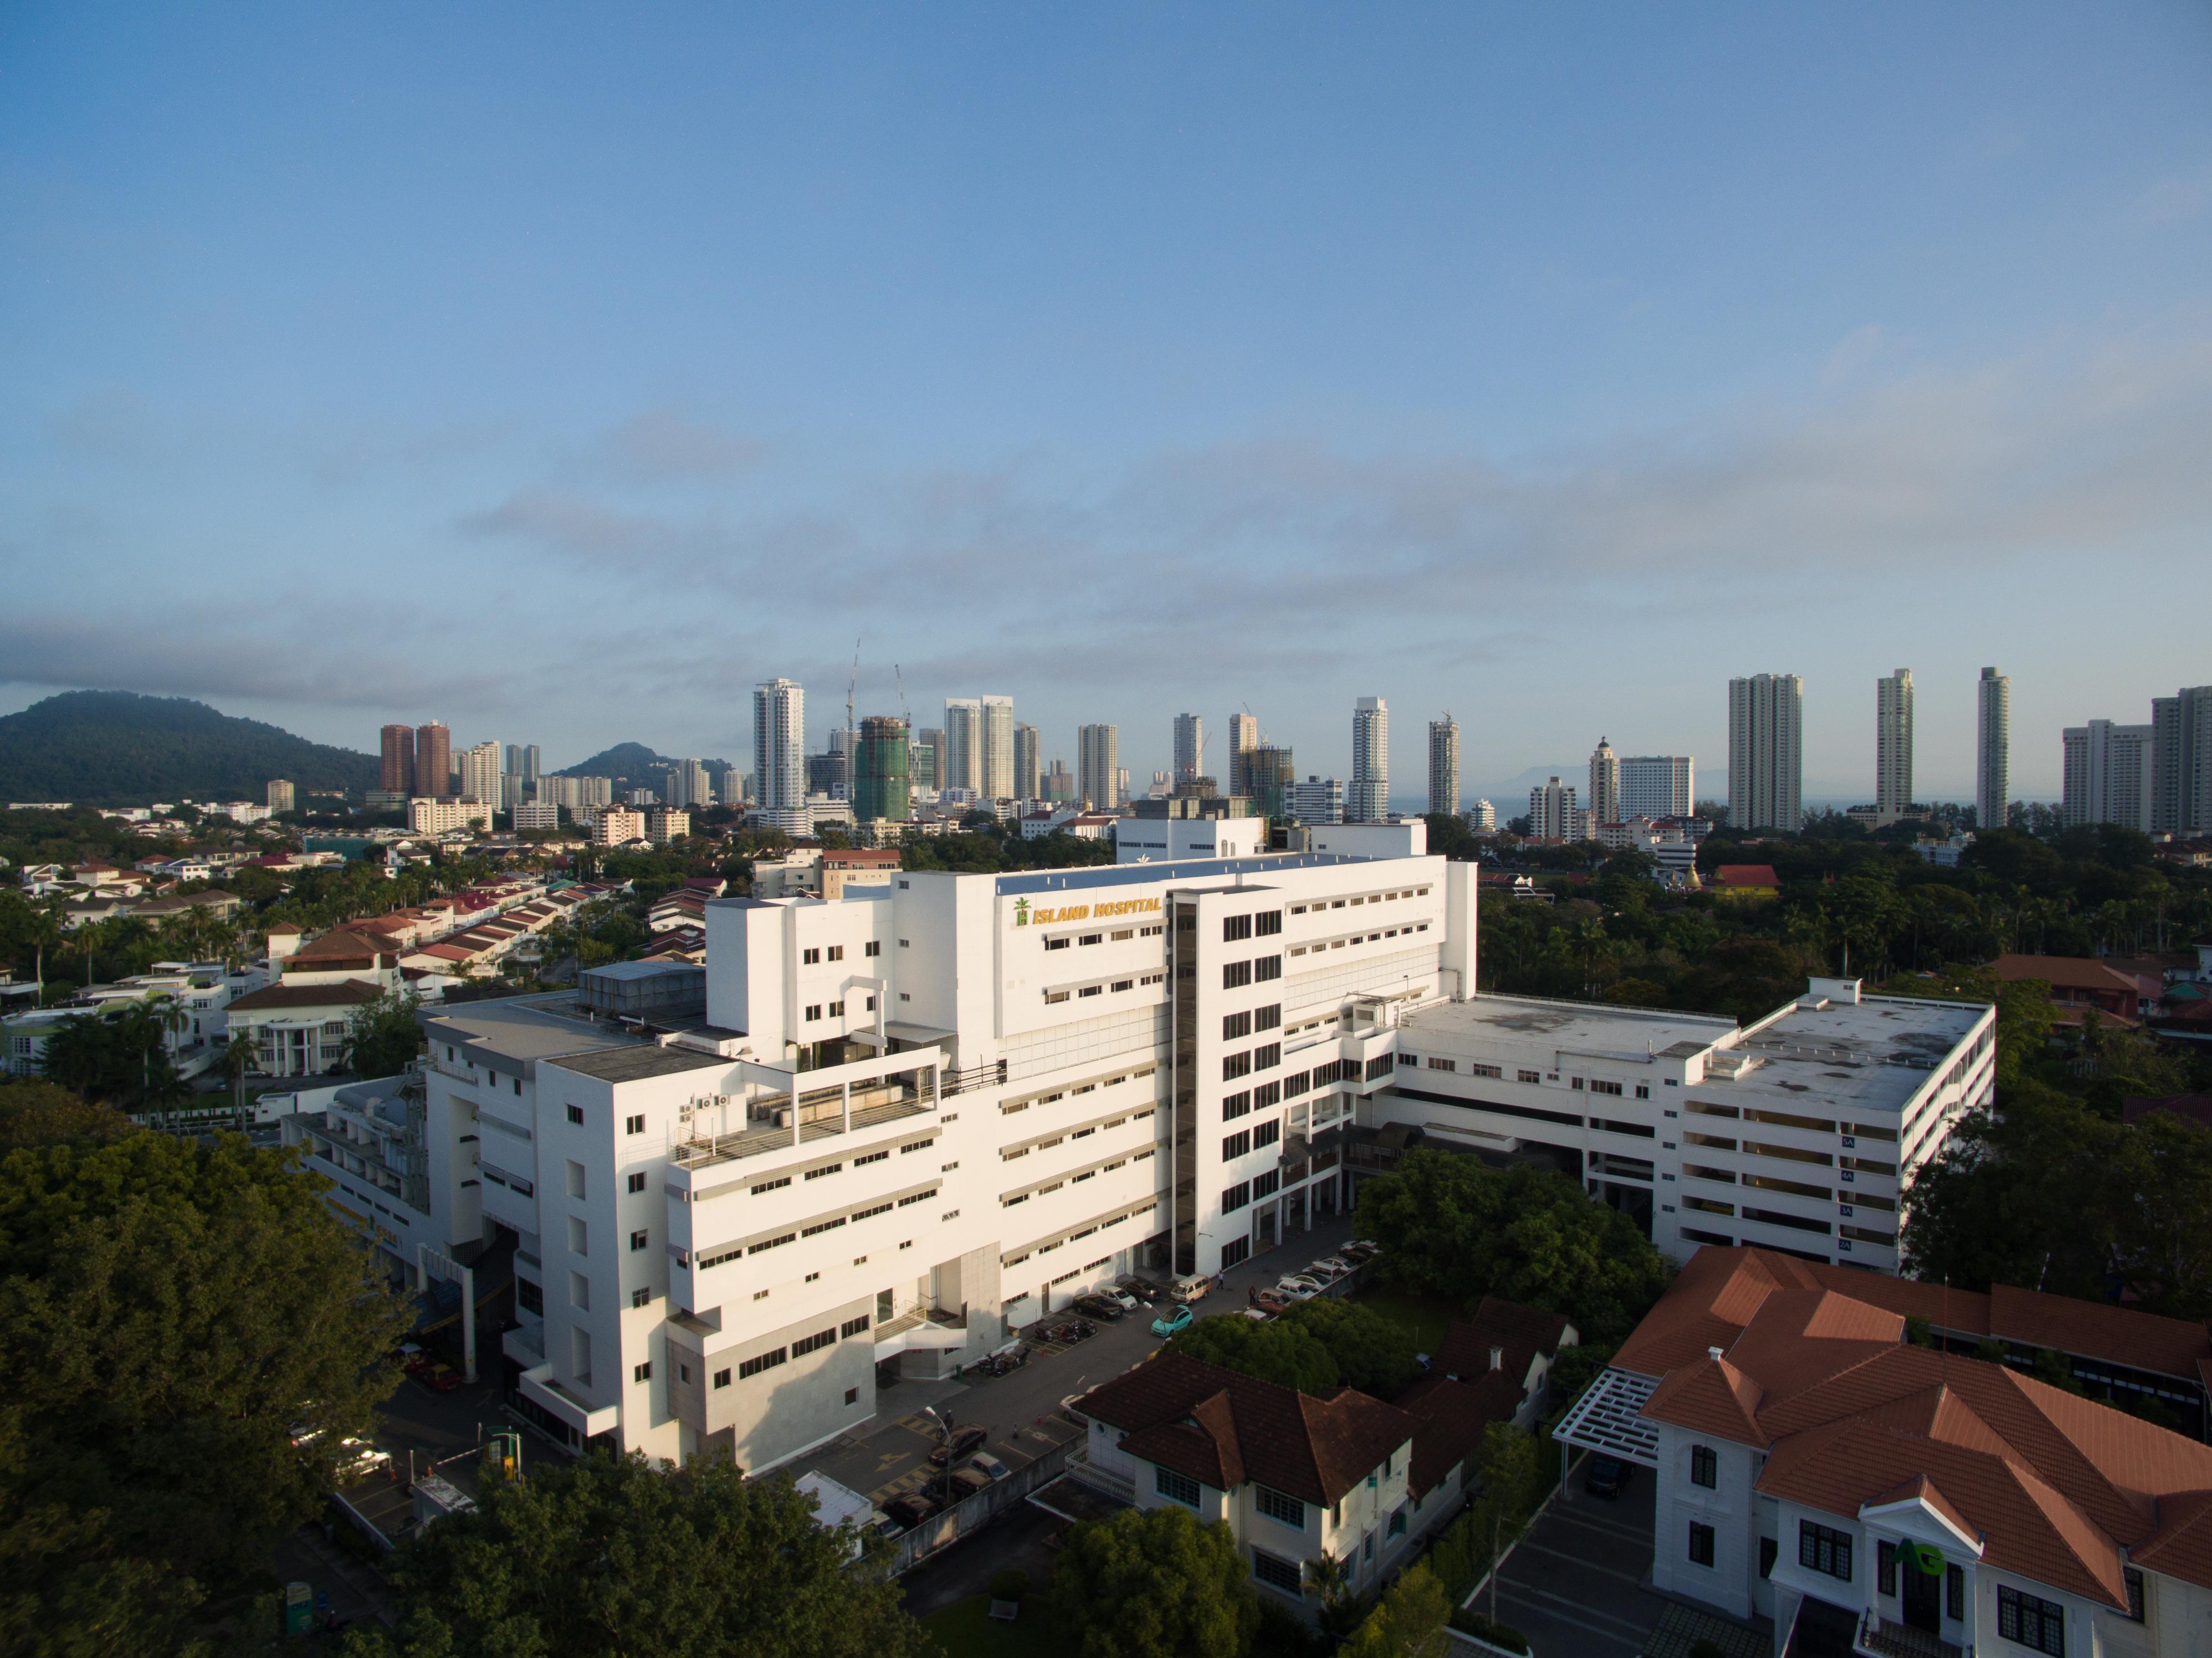 Island Hospital Wikipedia